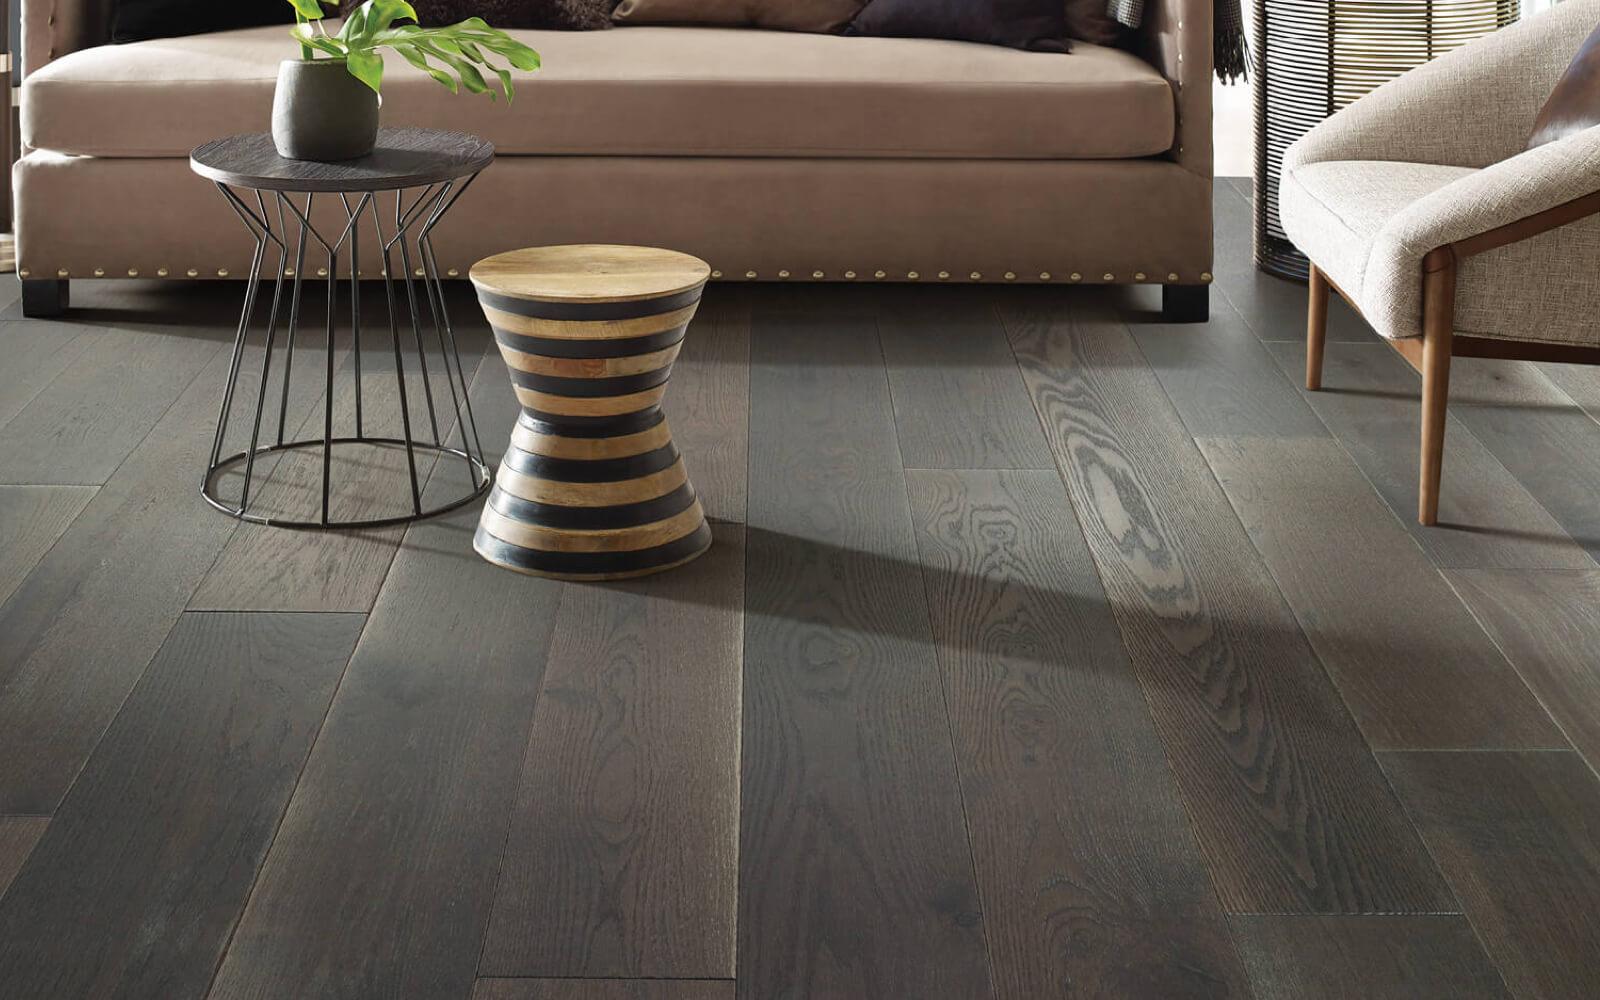 Hardwood flooring | Markville Carpet & Flooring